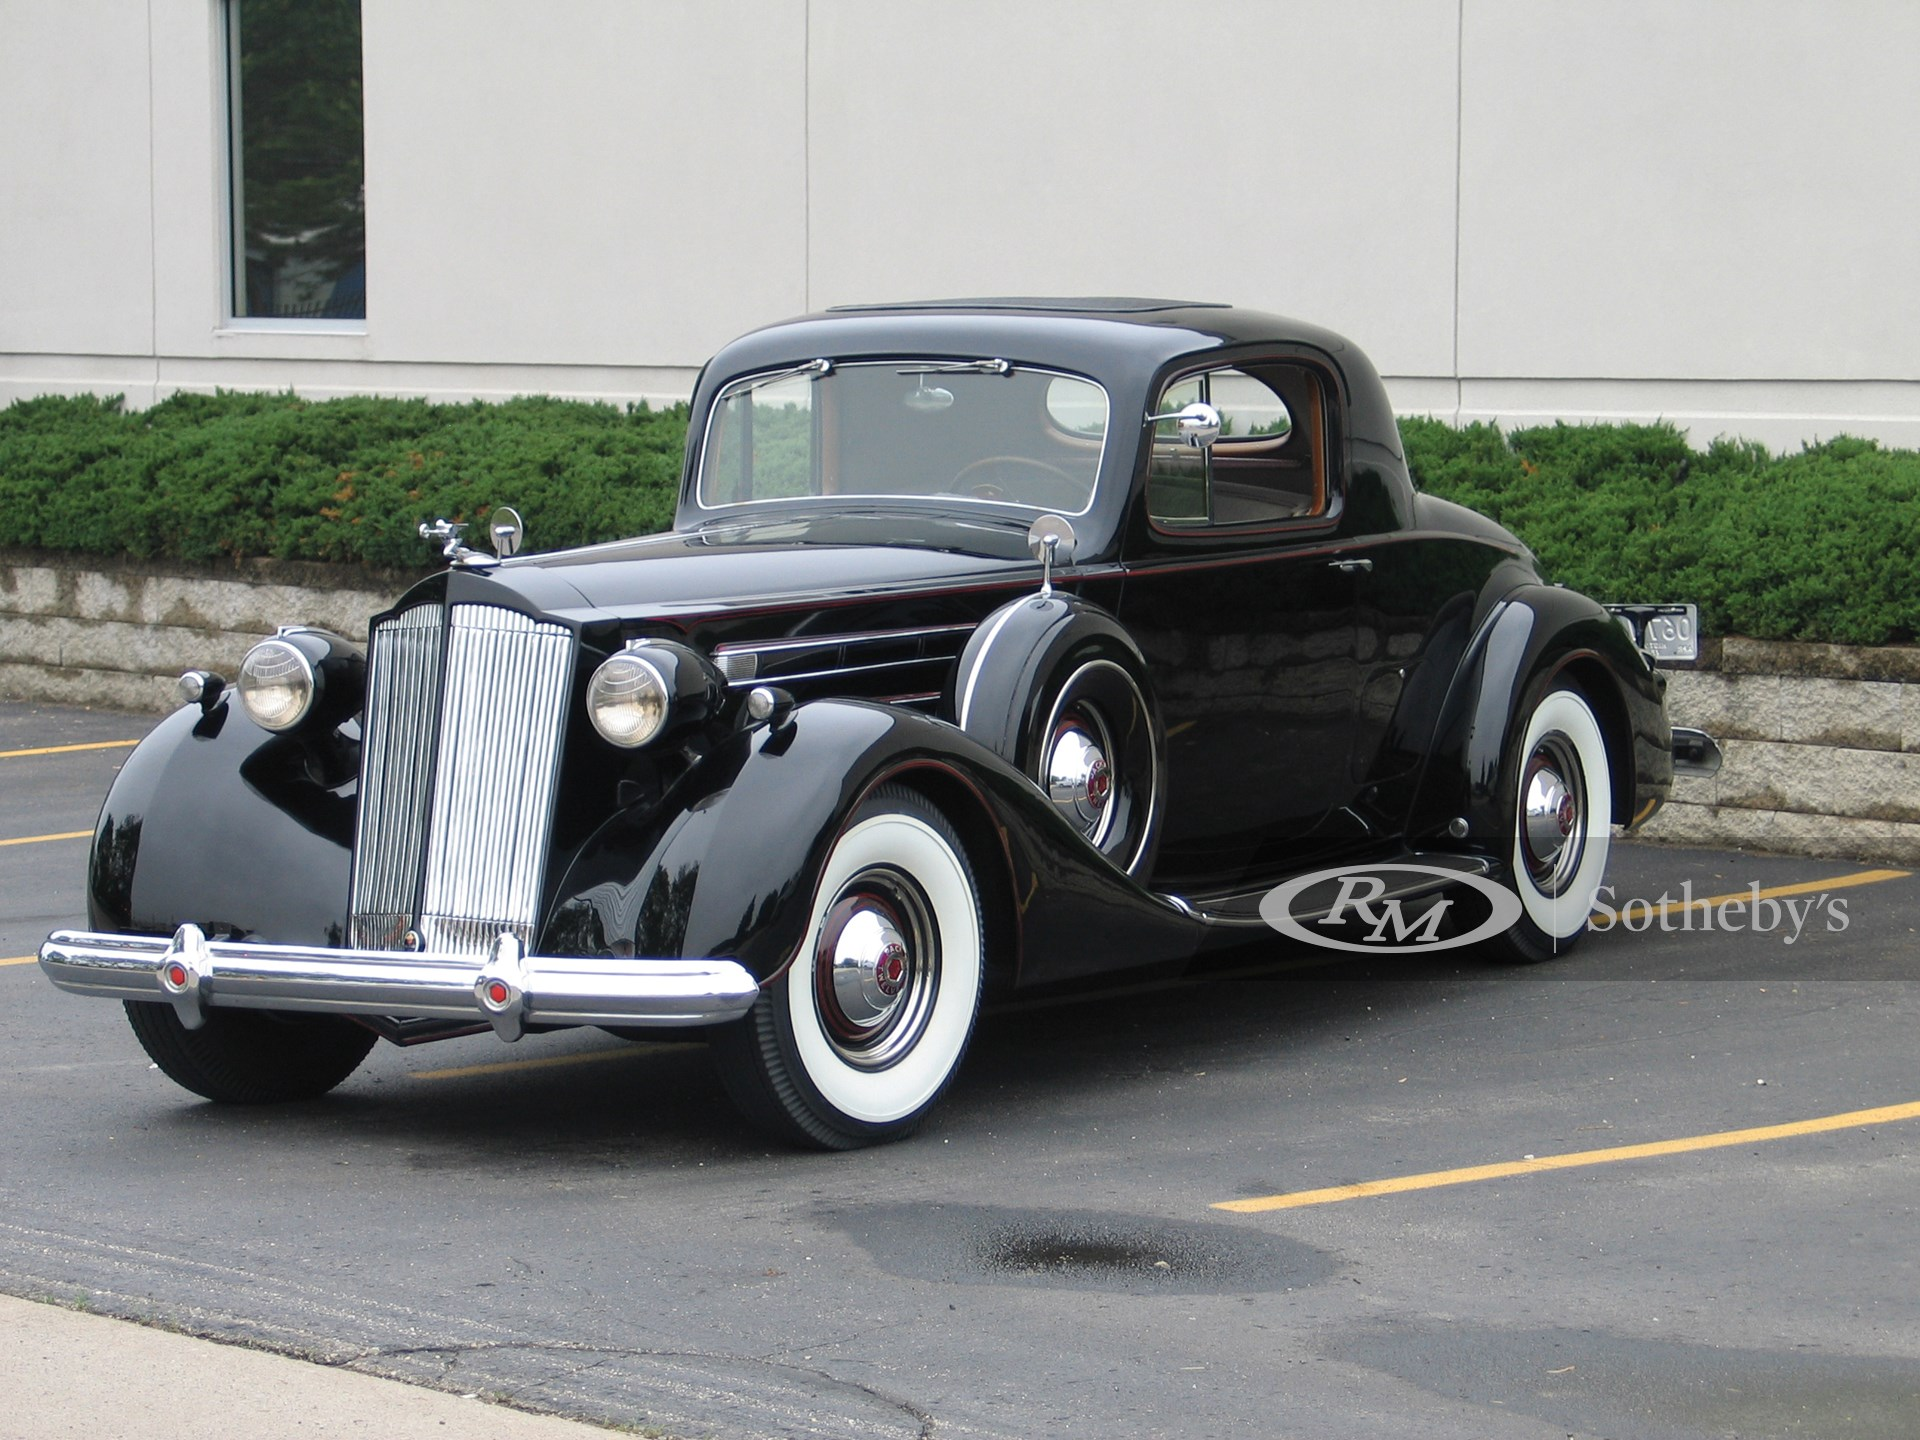 1937 Packard Twelve 2/4 Passenger Coupe